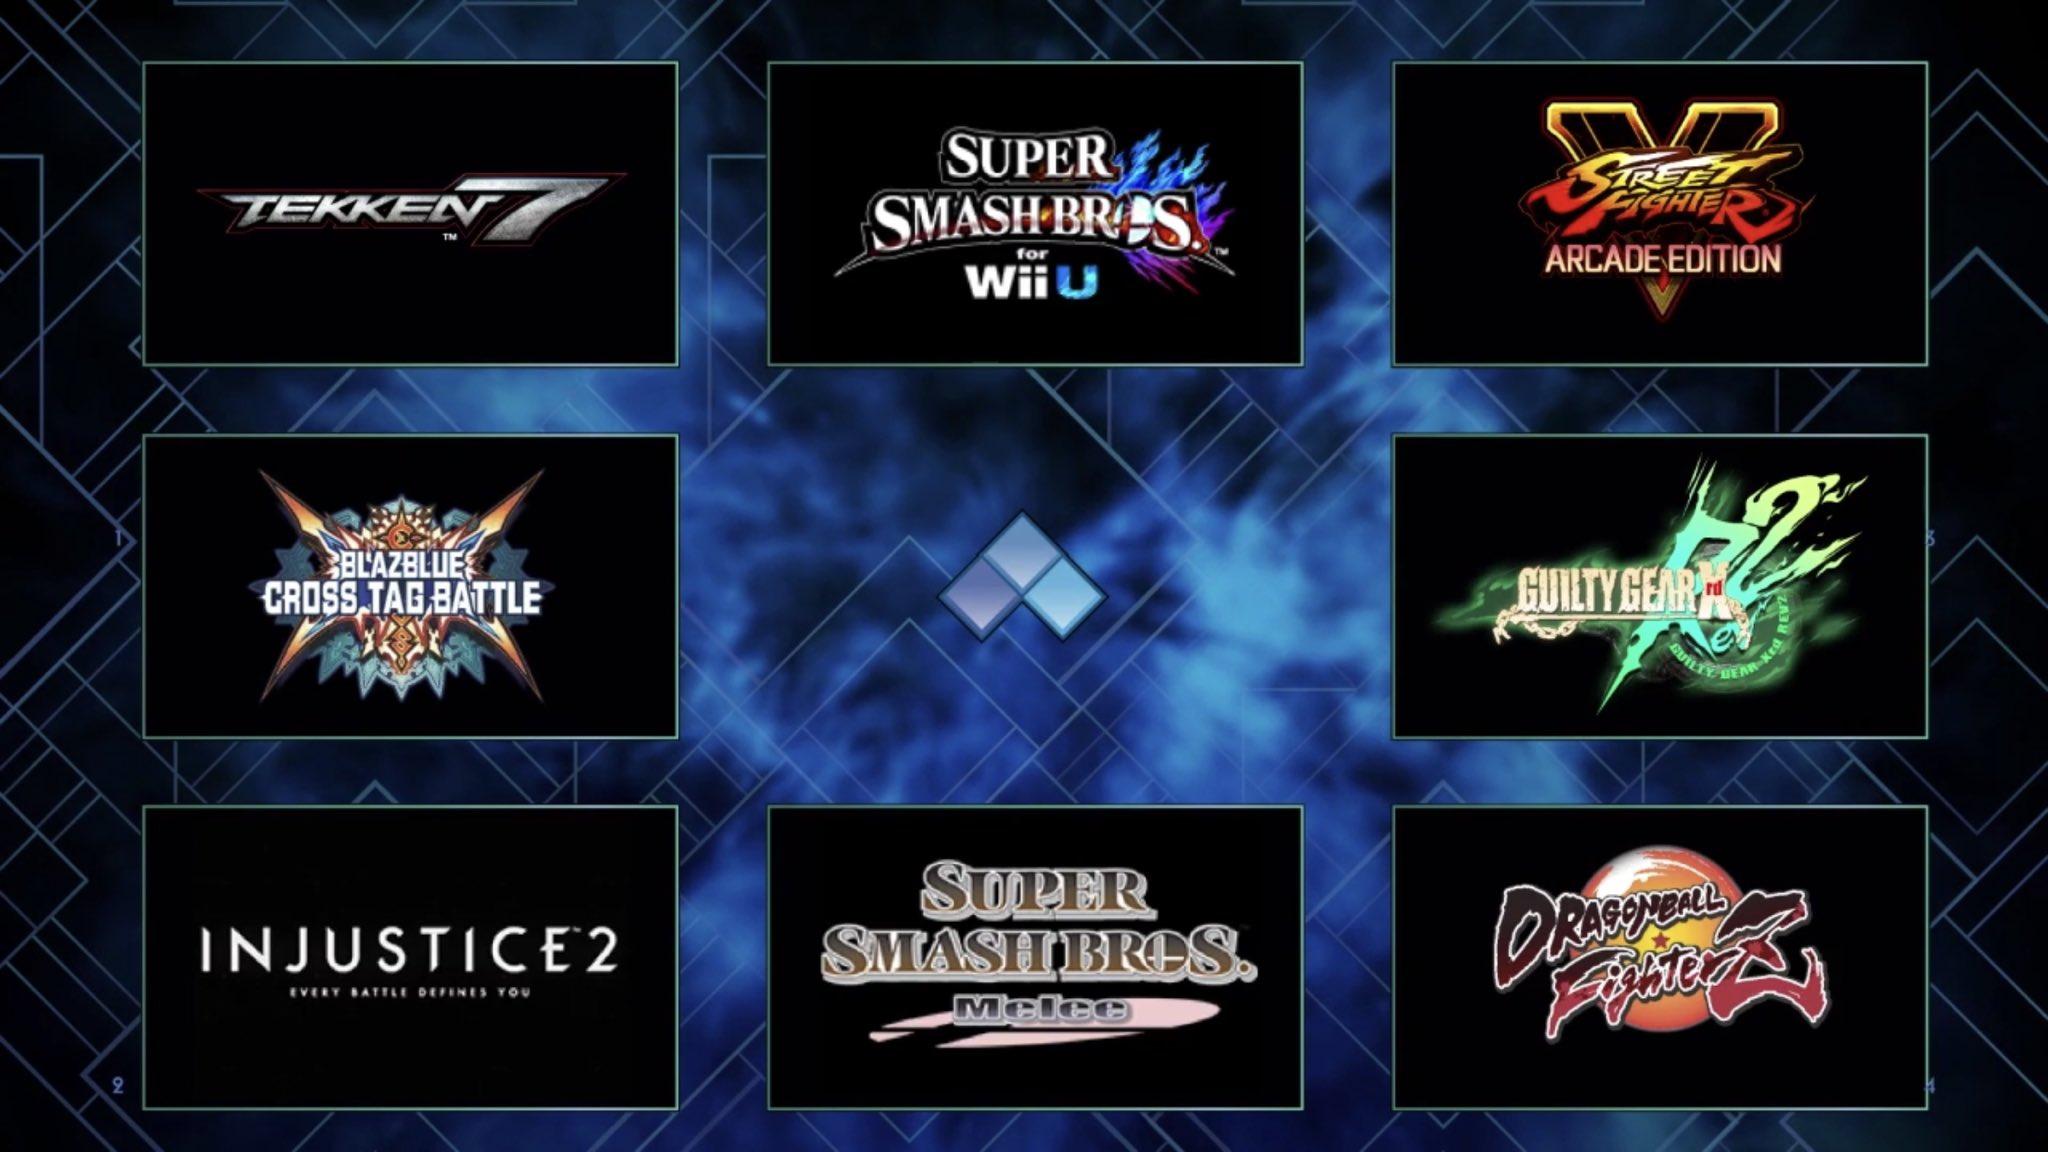 Dragon Ball FighterZ aura son tournoi à l'EVO 2018